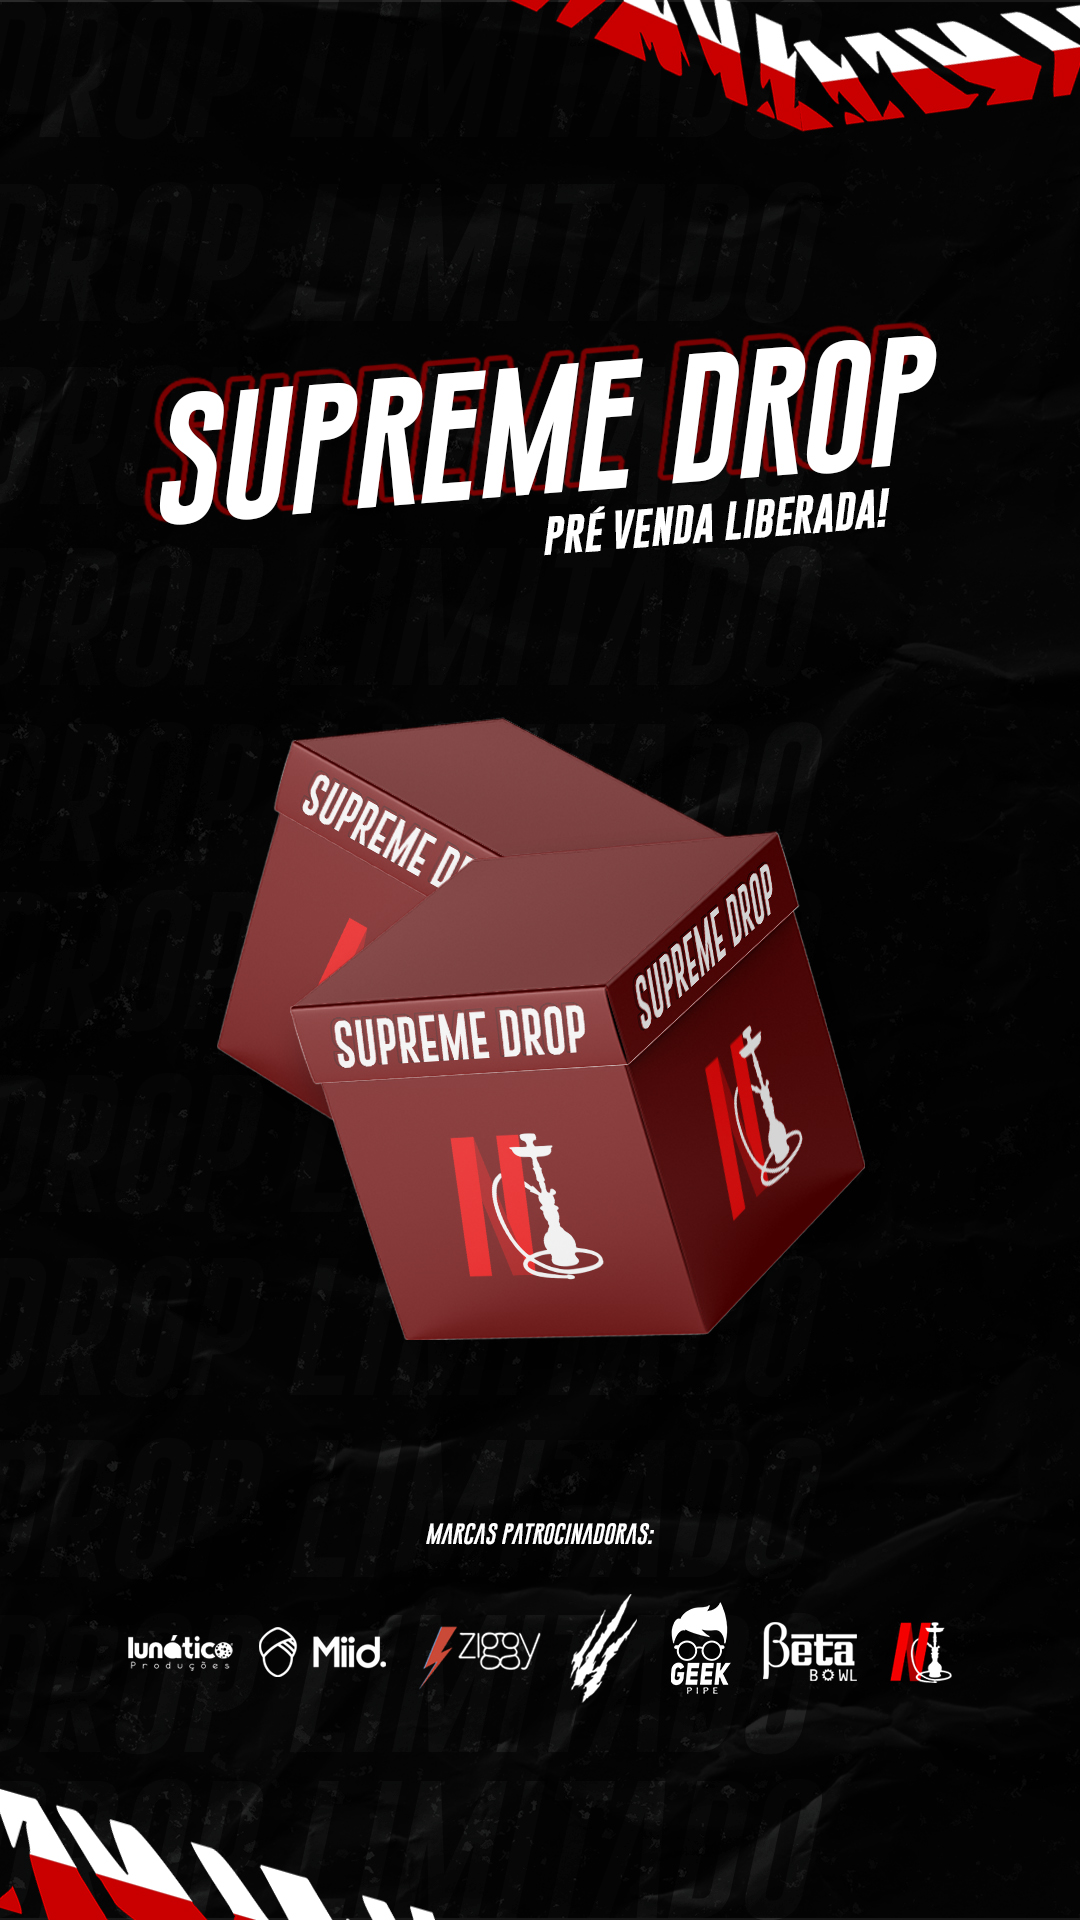 Supreme Drop